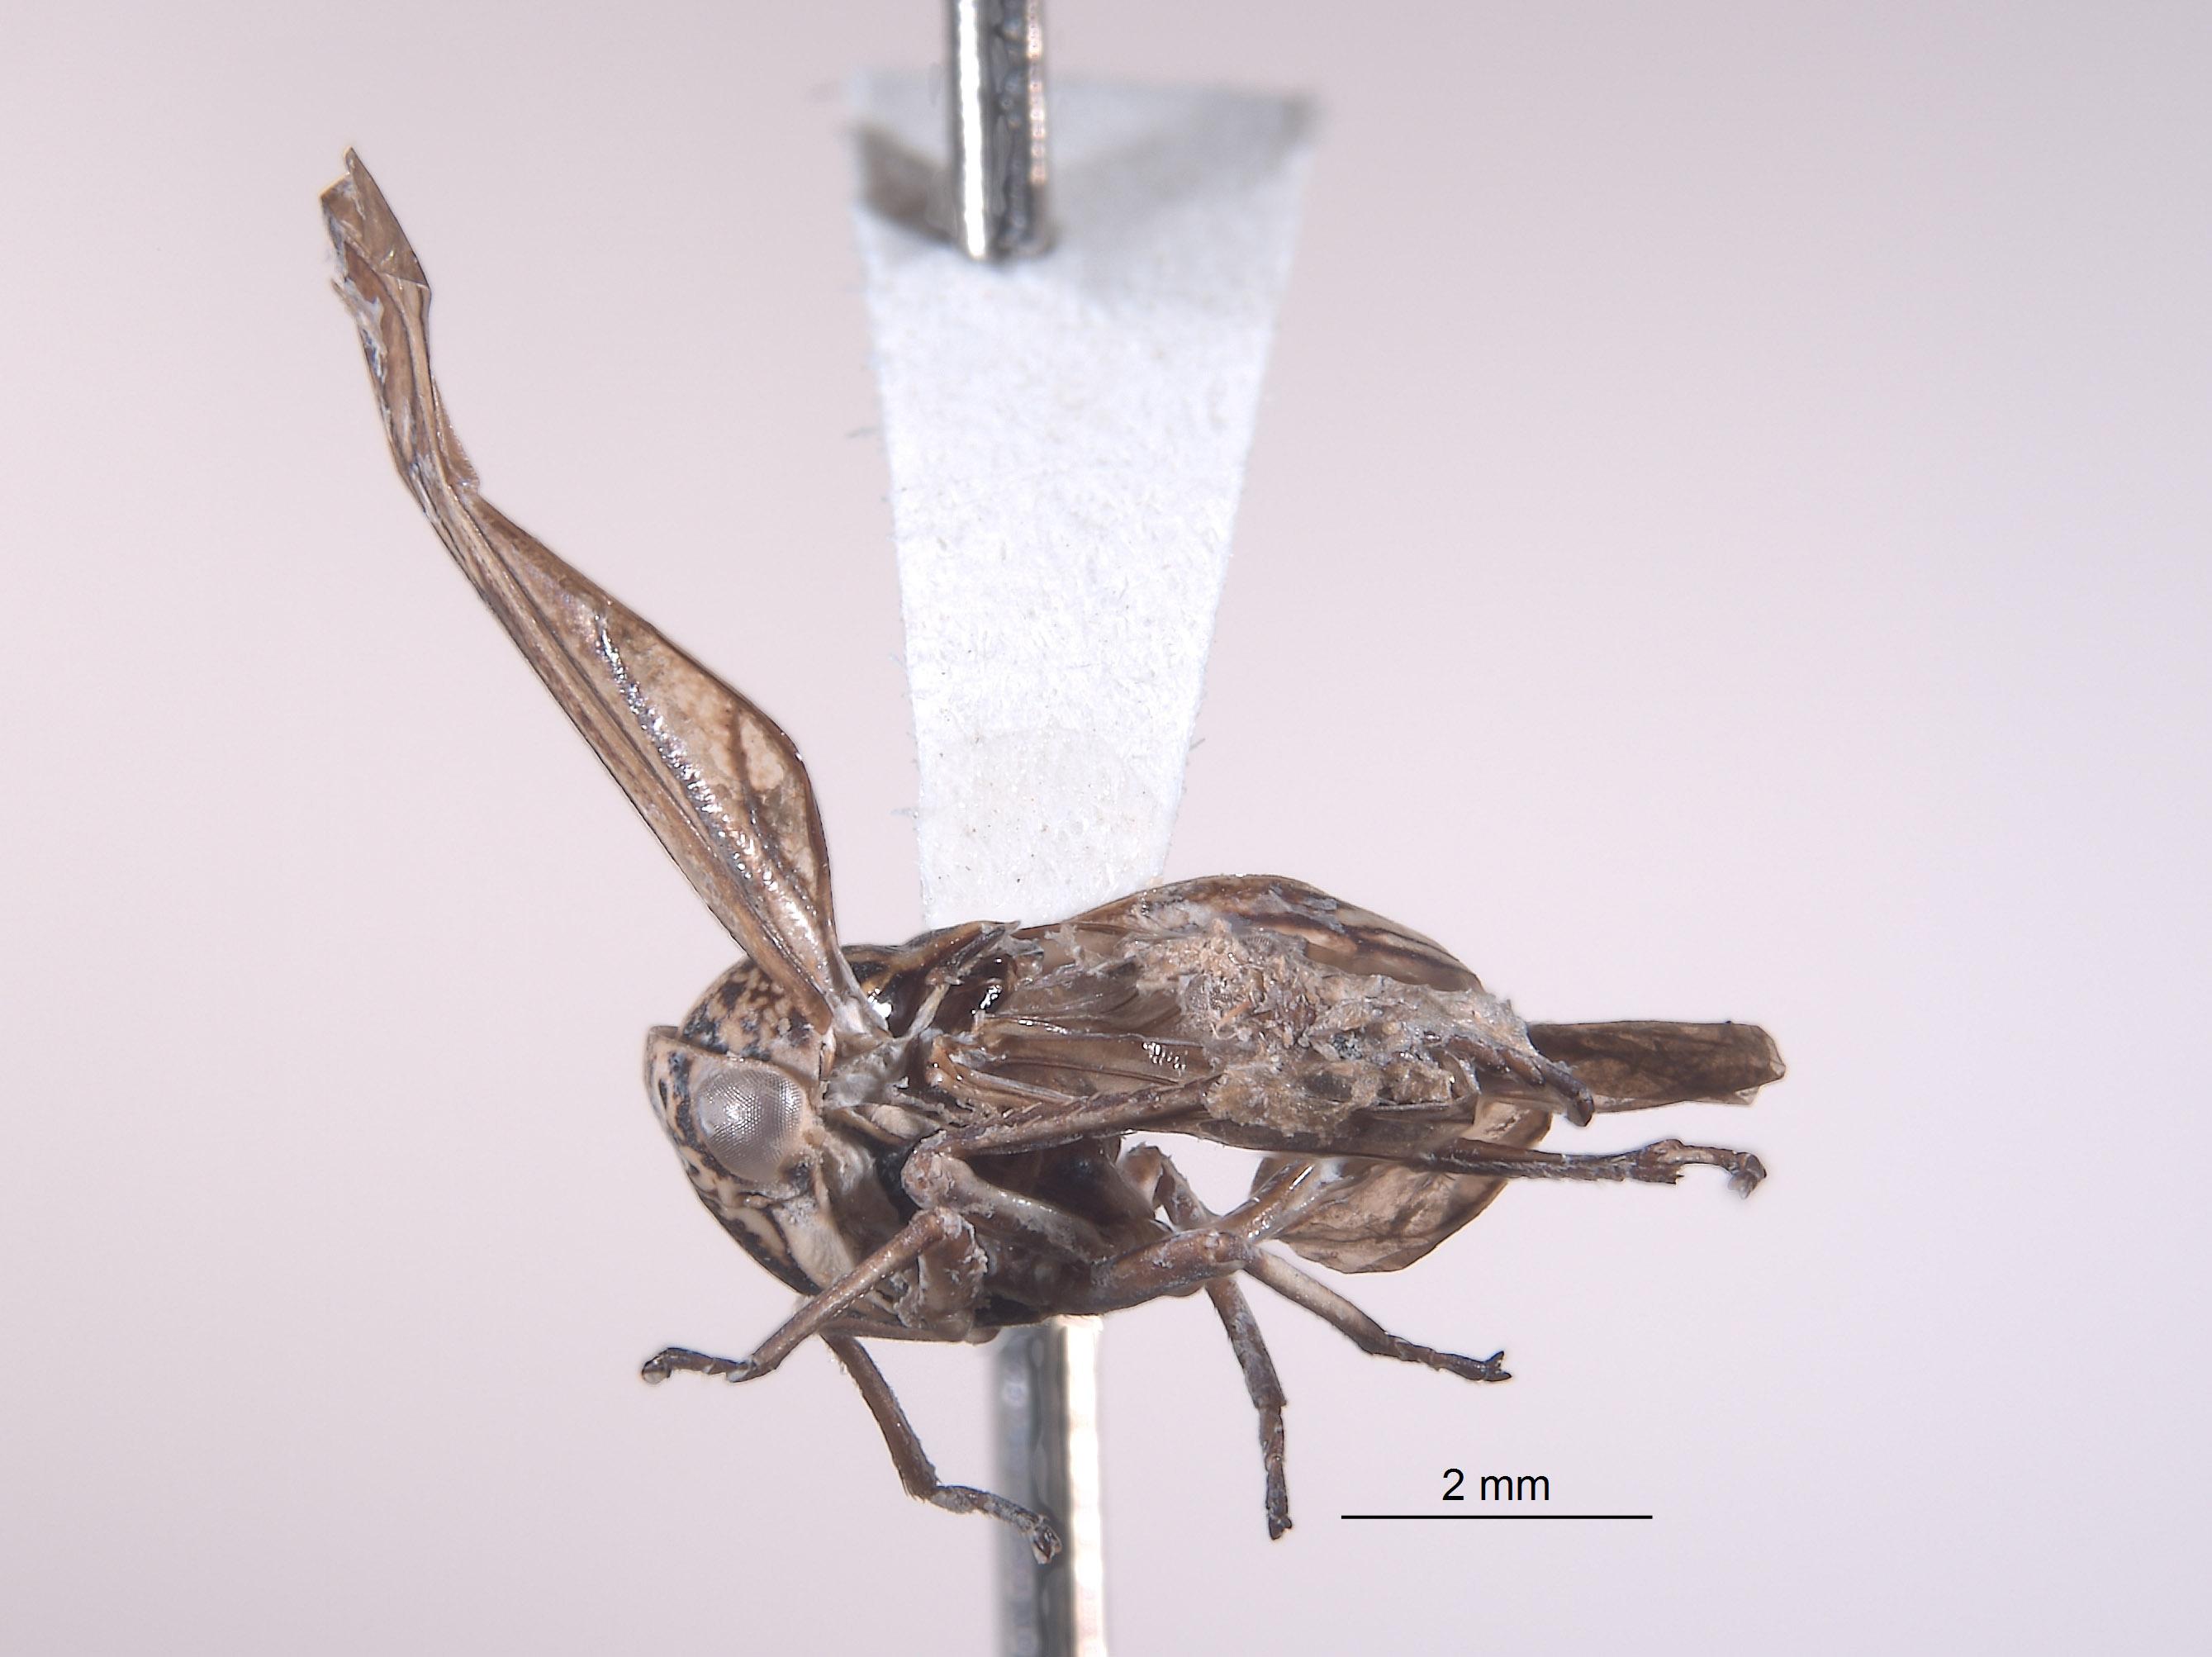 Mexicanocerus whitacrei image